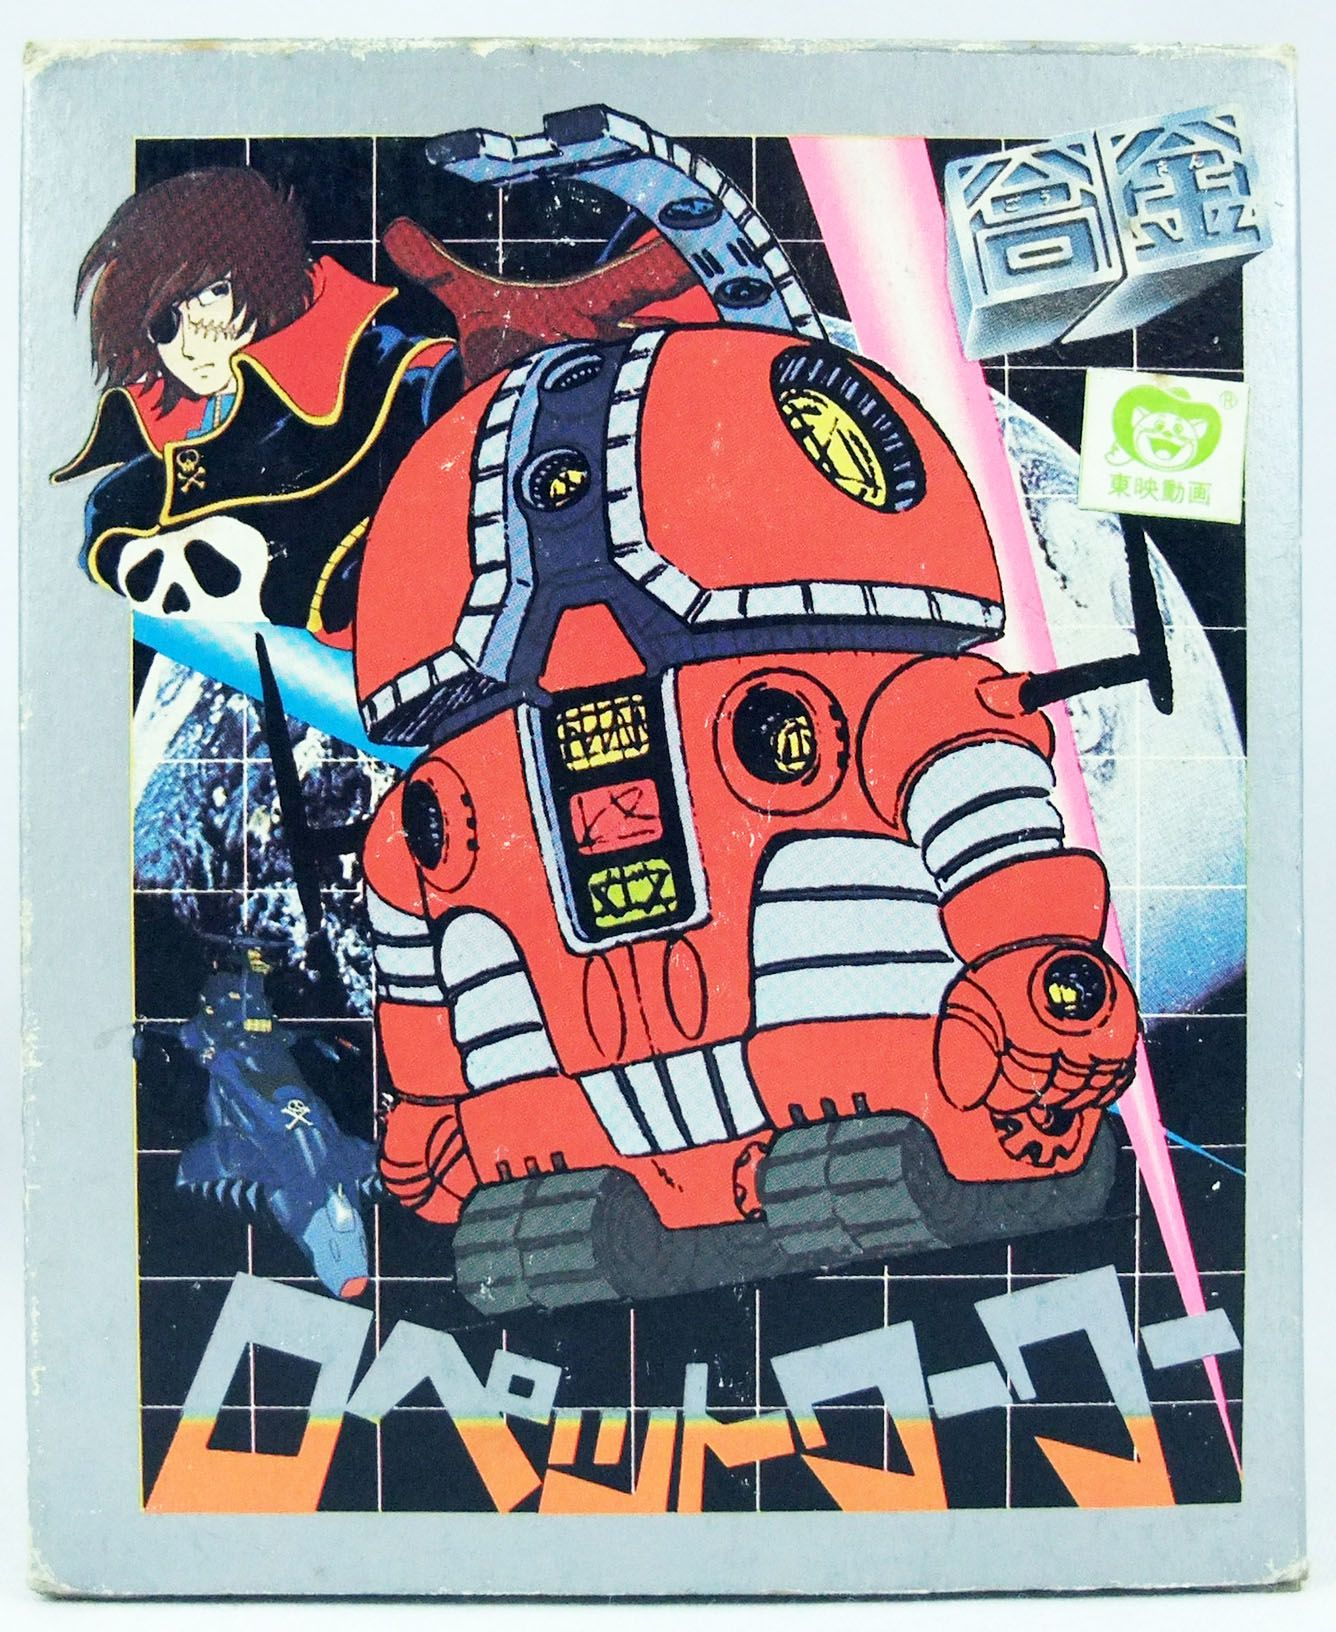 Albator - Robot BeBop War War die-cast metal (neuf en boite) - Takatoku